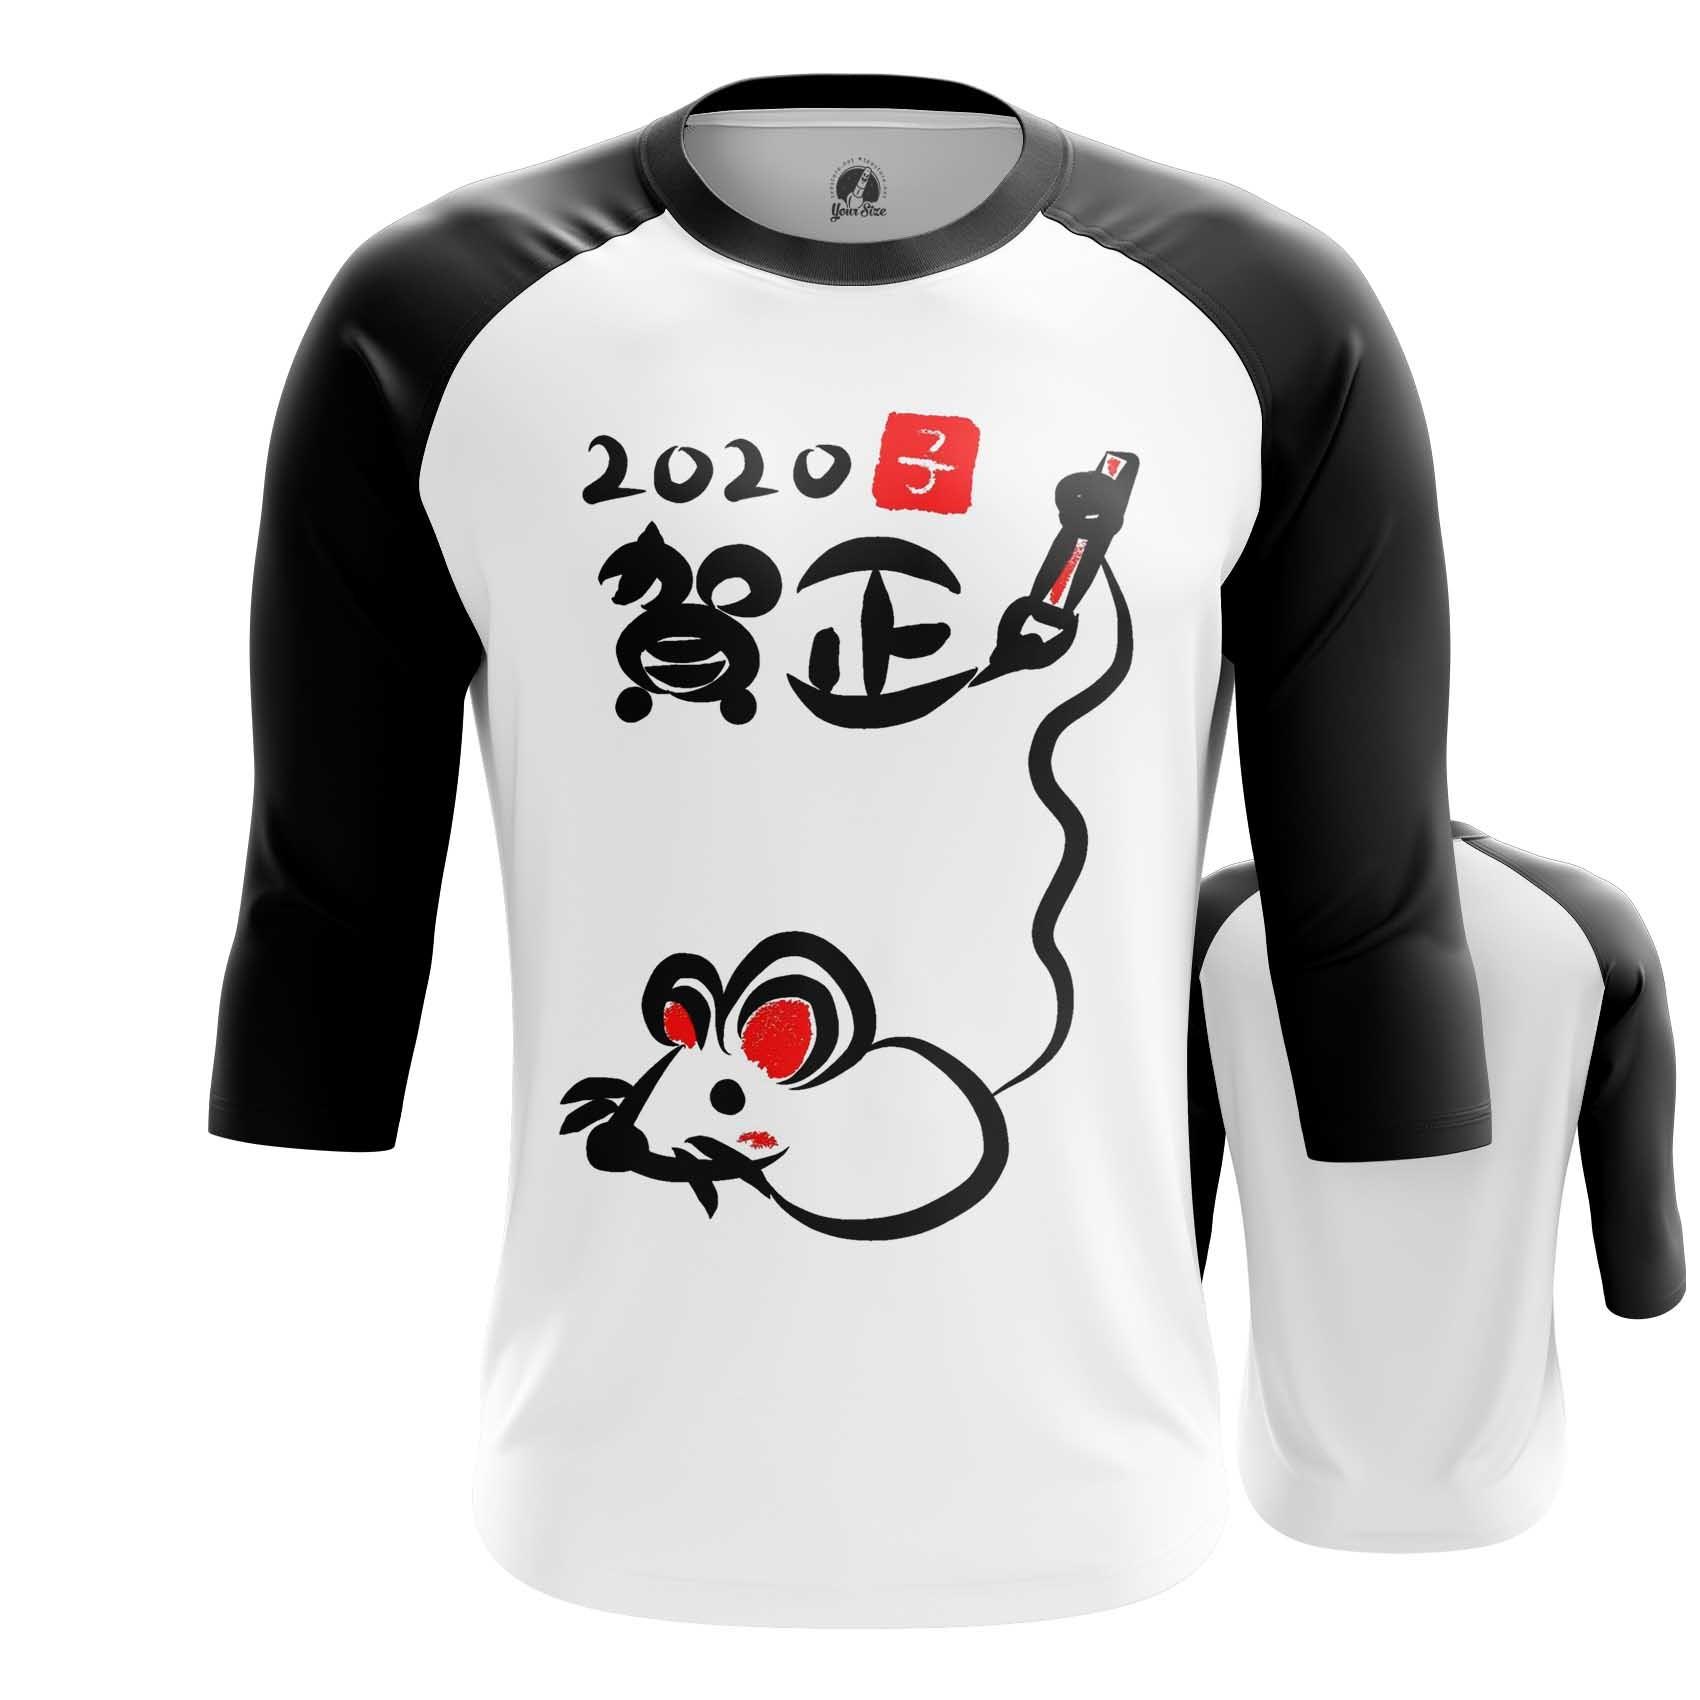 Merchandise Men'S Long Sleeve Chinese New Year 2020 Symbols